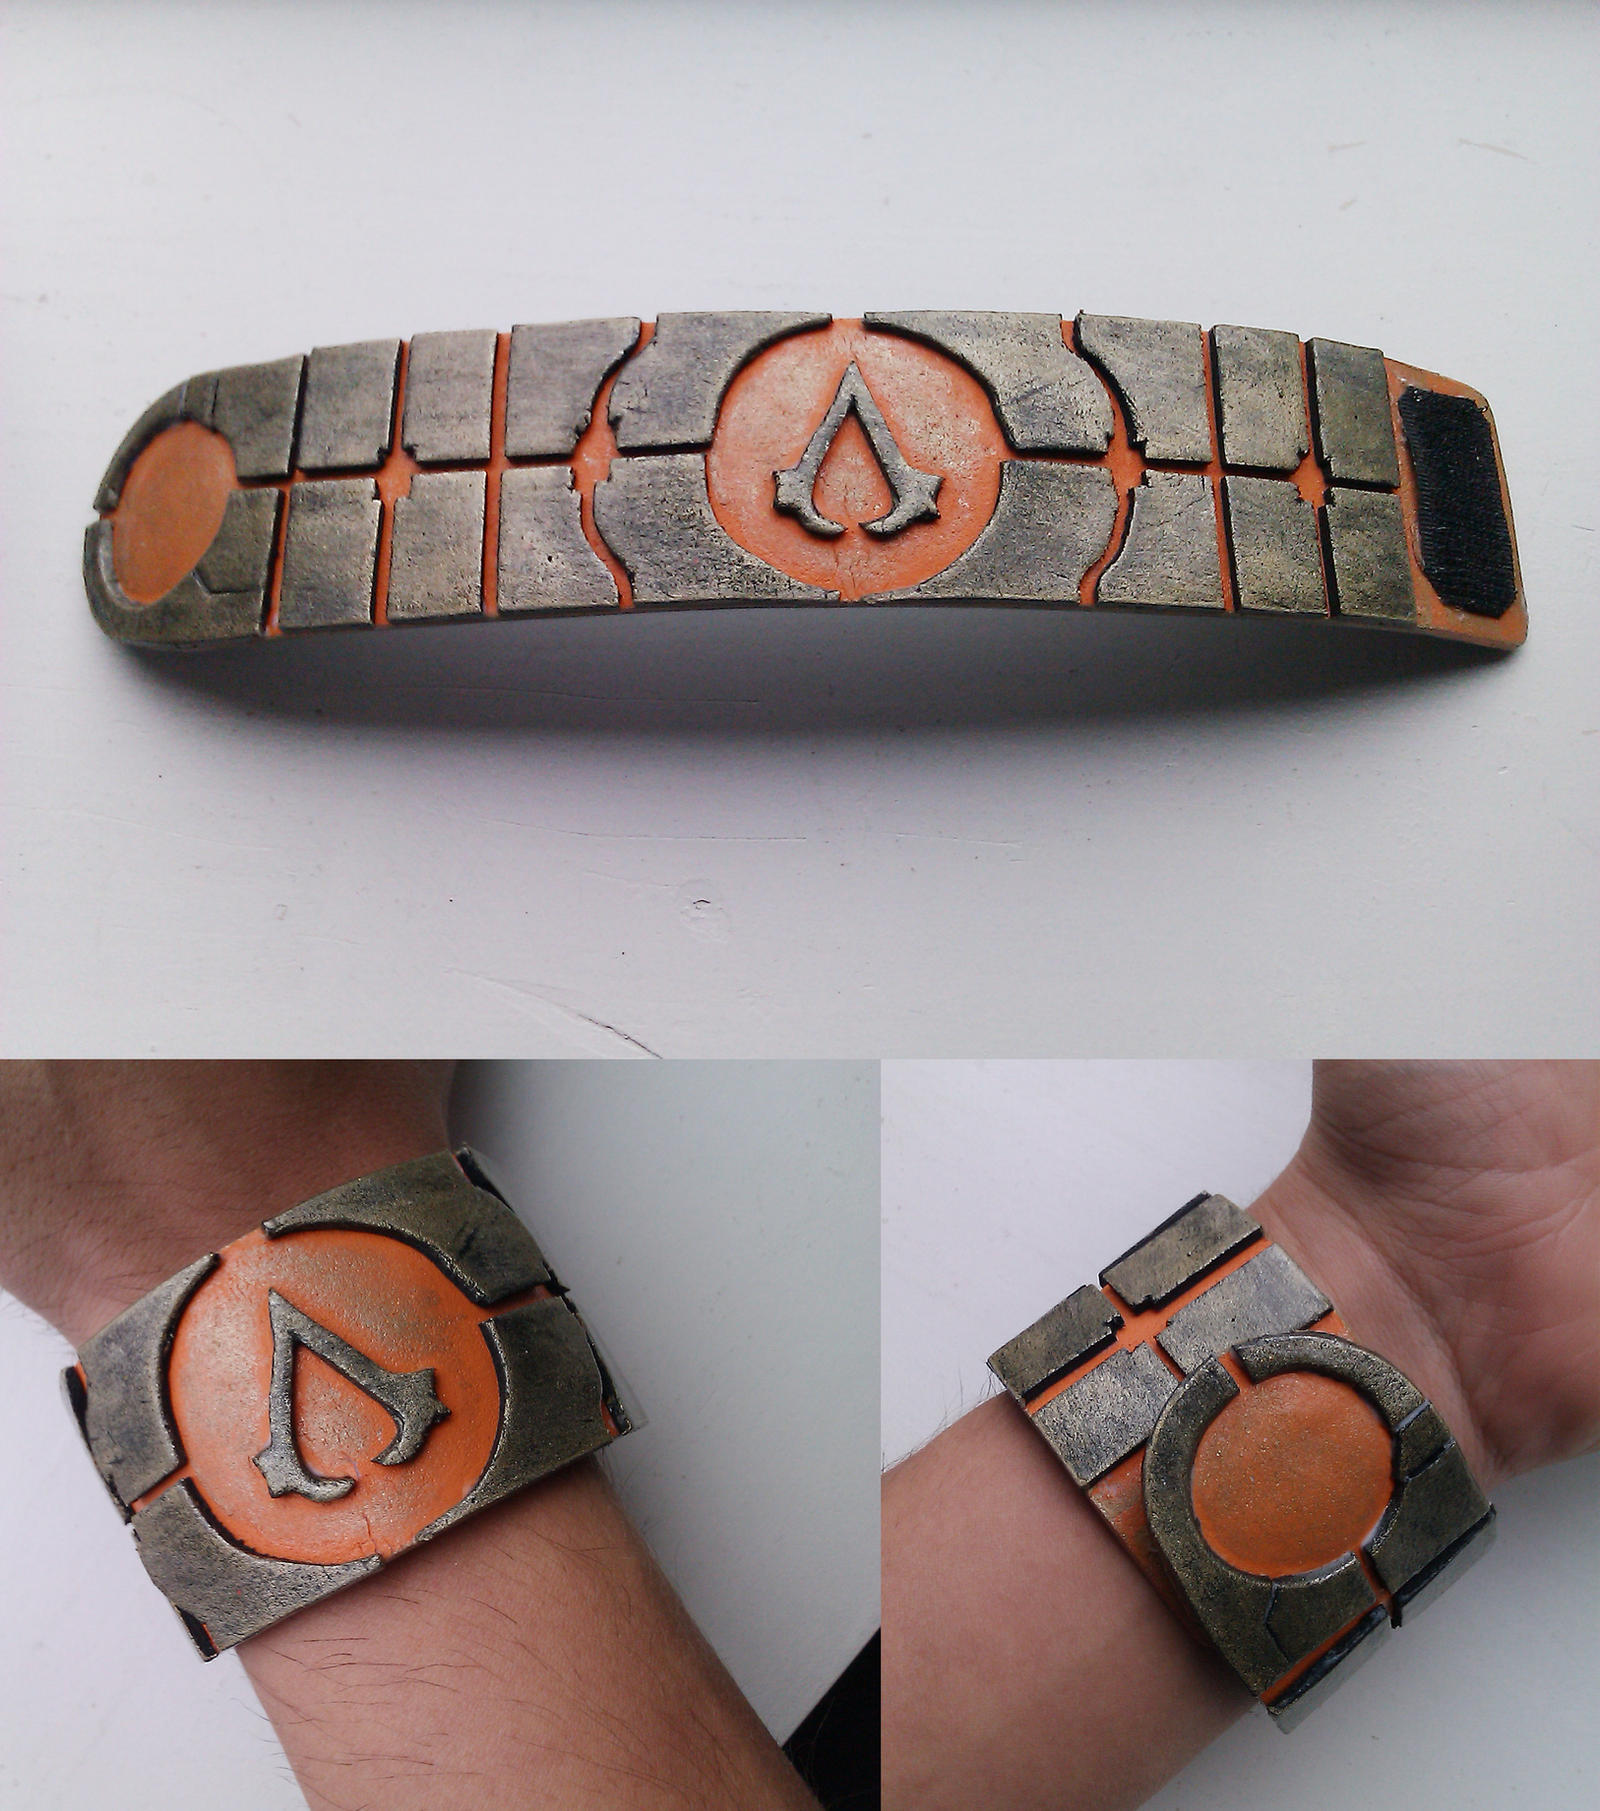 assassin 39 s creed apple of eden inspired bracelet by tha fire dude on deviantart. Black Bedroom Furniture Sets. Home Design Ideas